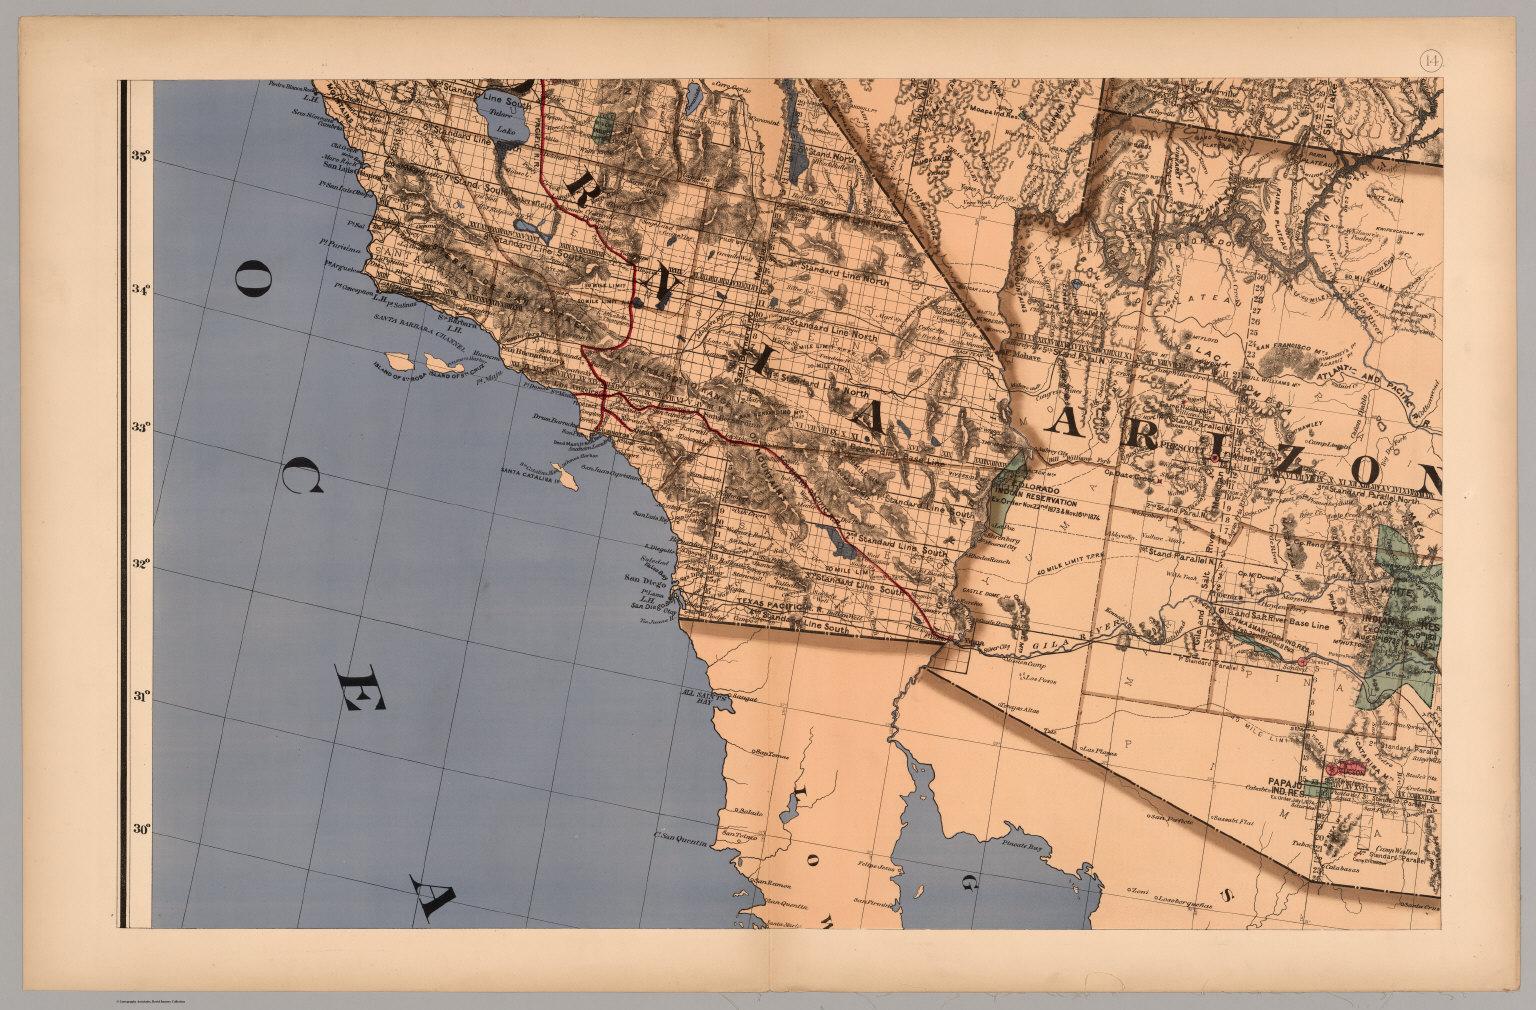 Map 14 - California, Arizona, Nevada). - David Rumsey Historical Map ...